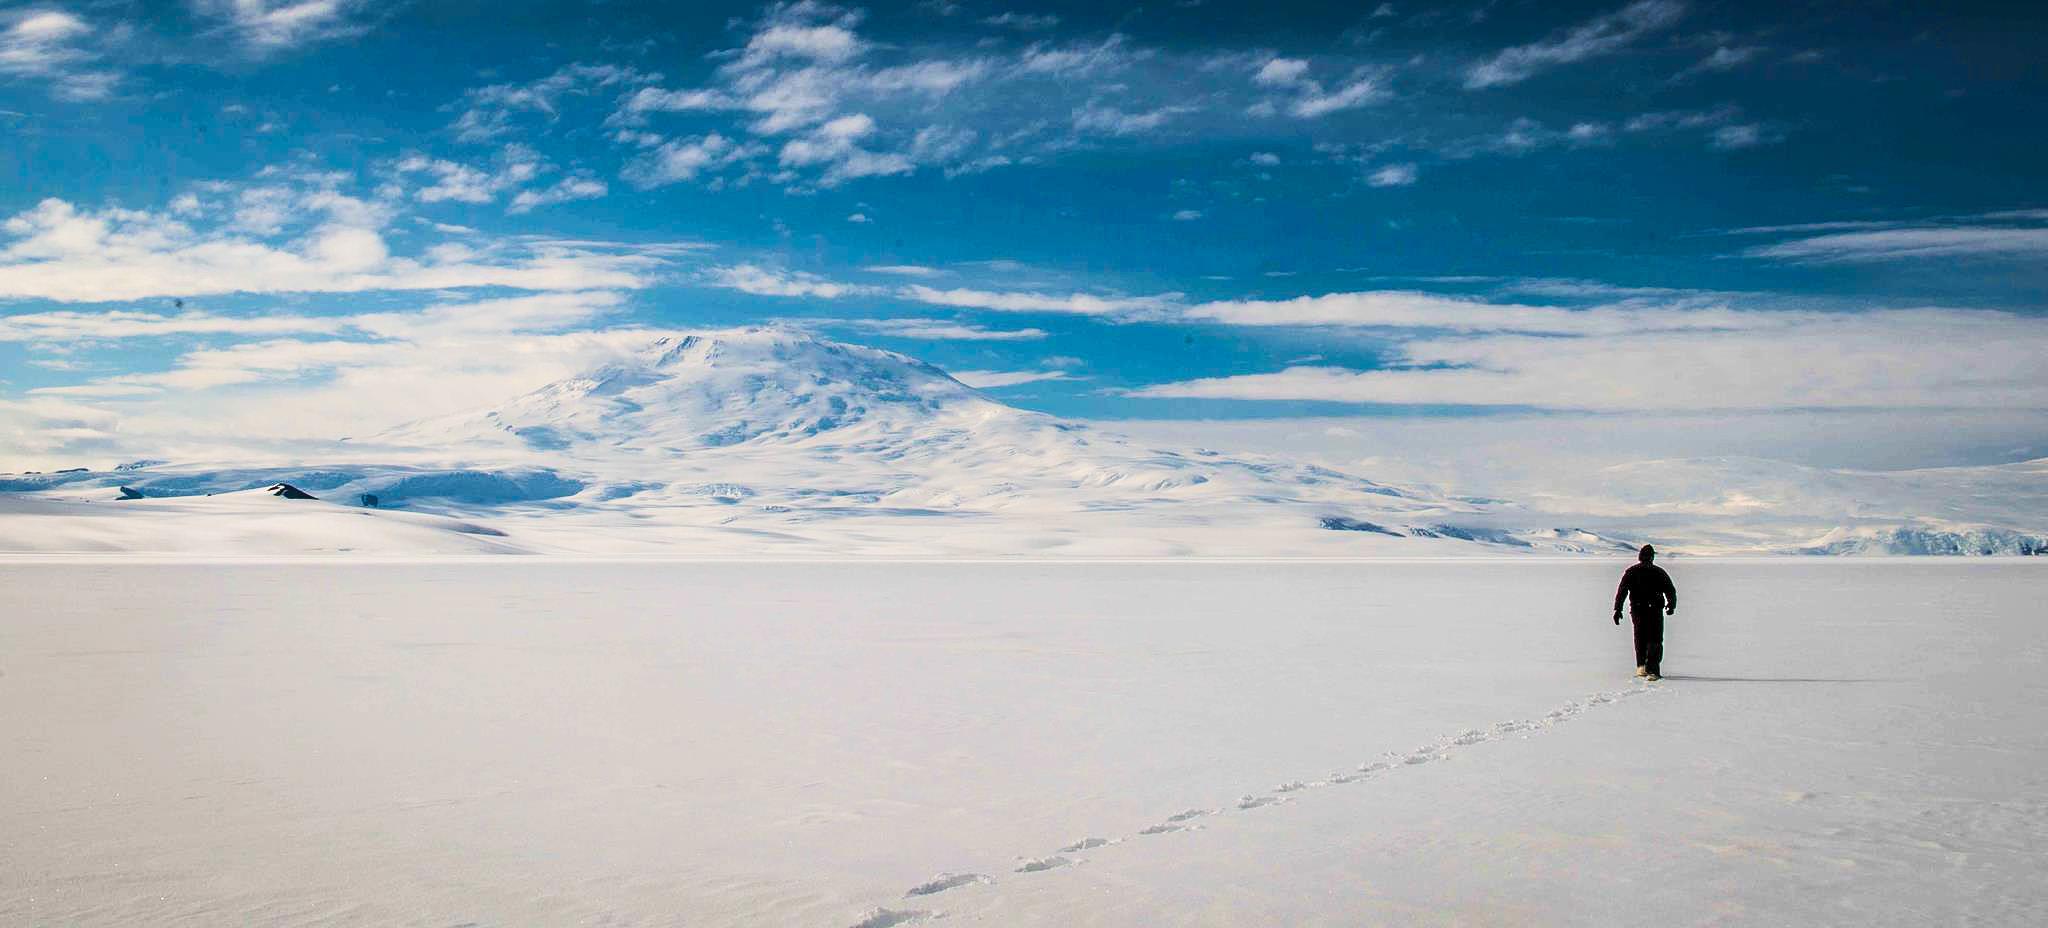 Antarctic_solo_journey-2.jpg